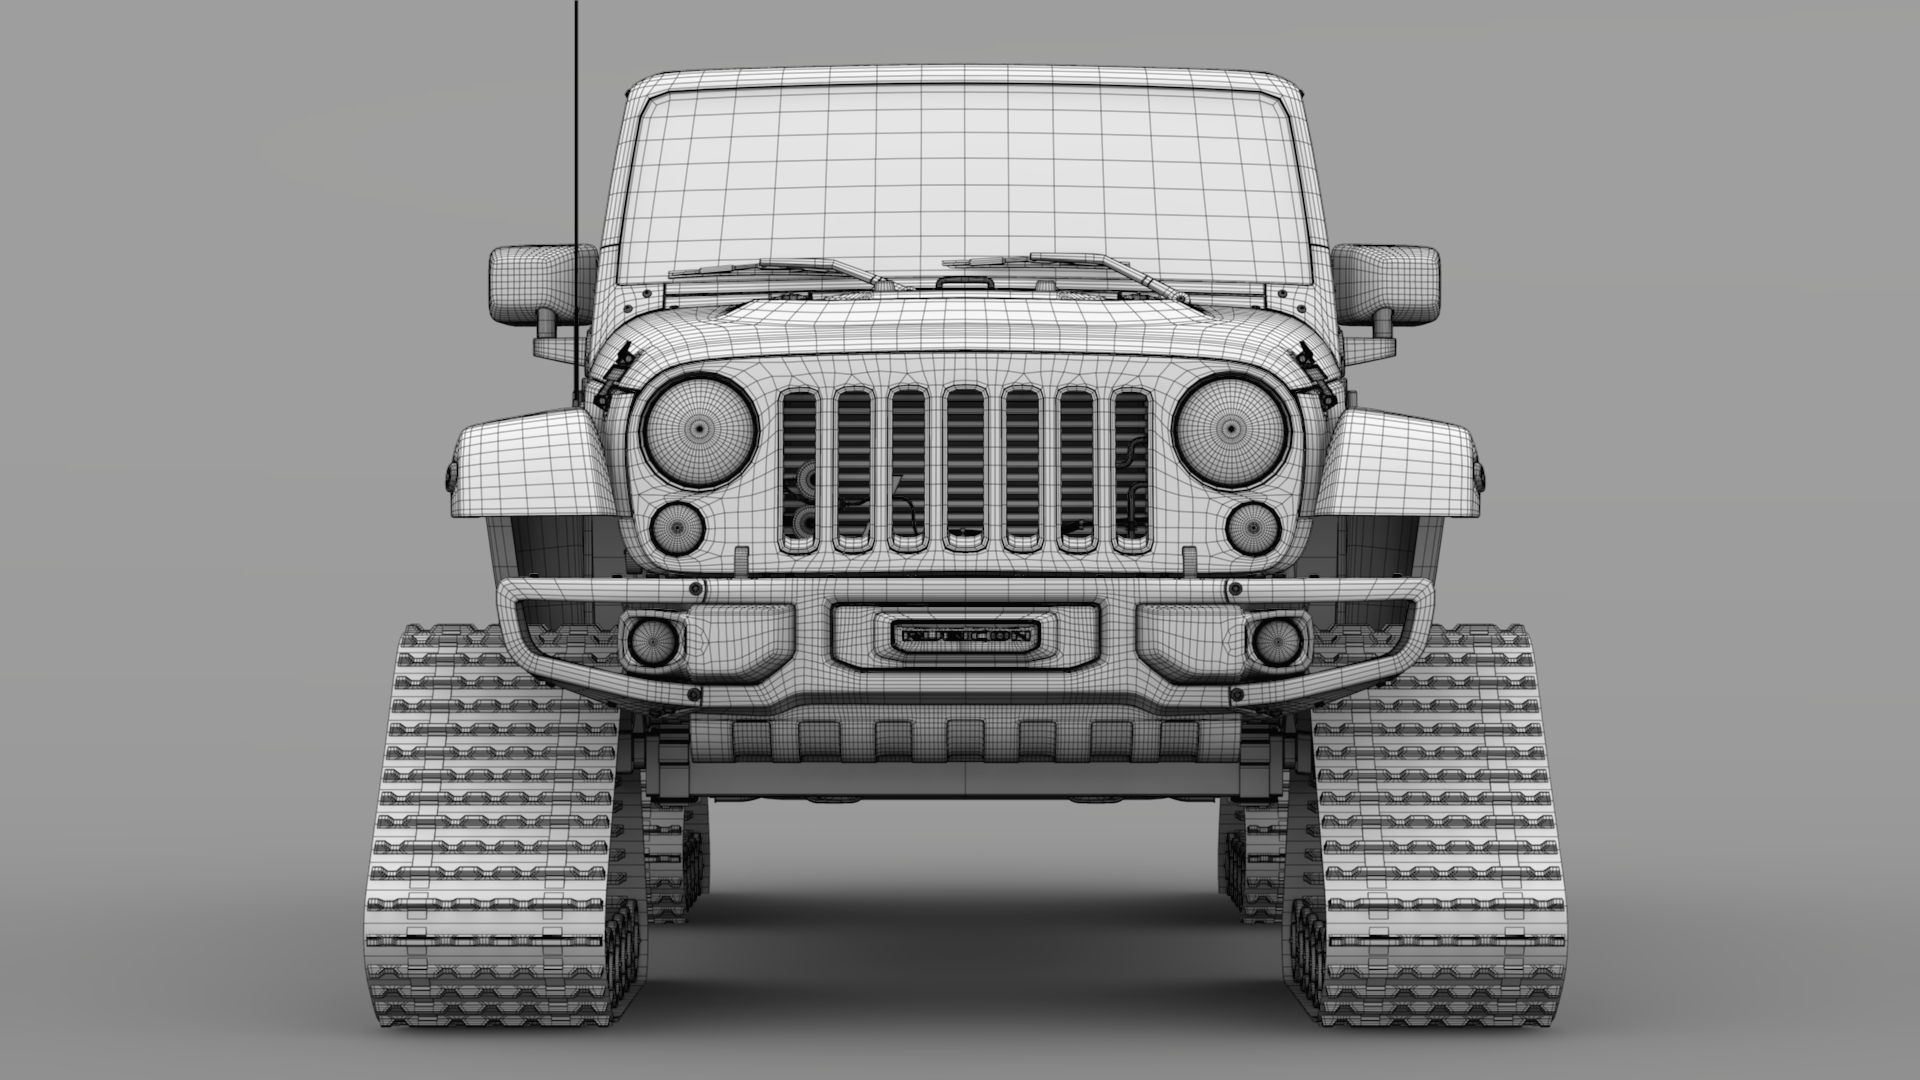 jeep wrangler crawler rubicon recon jk 2017 3d model max fbx c4d lwo ma mb hrc xsi obj 276920